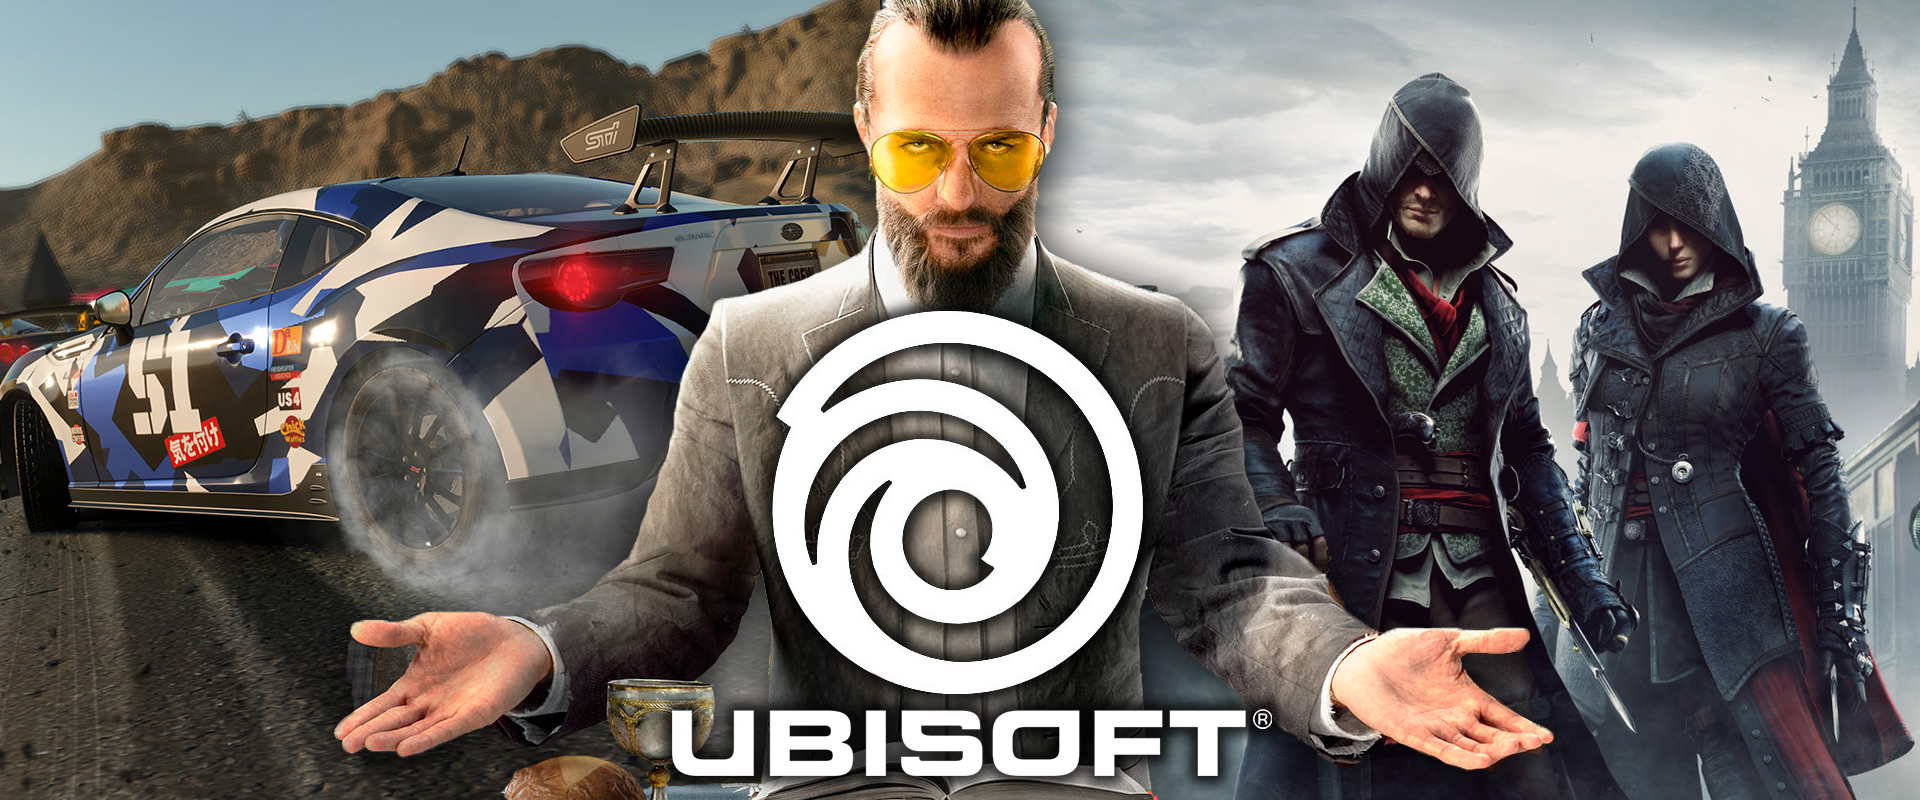 UbisoftE3.png